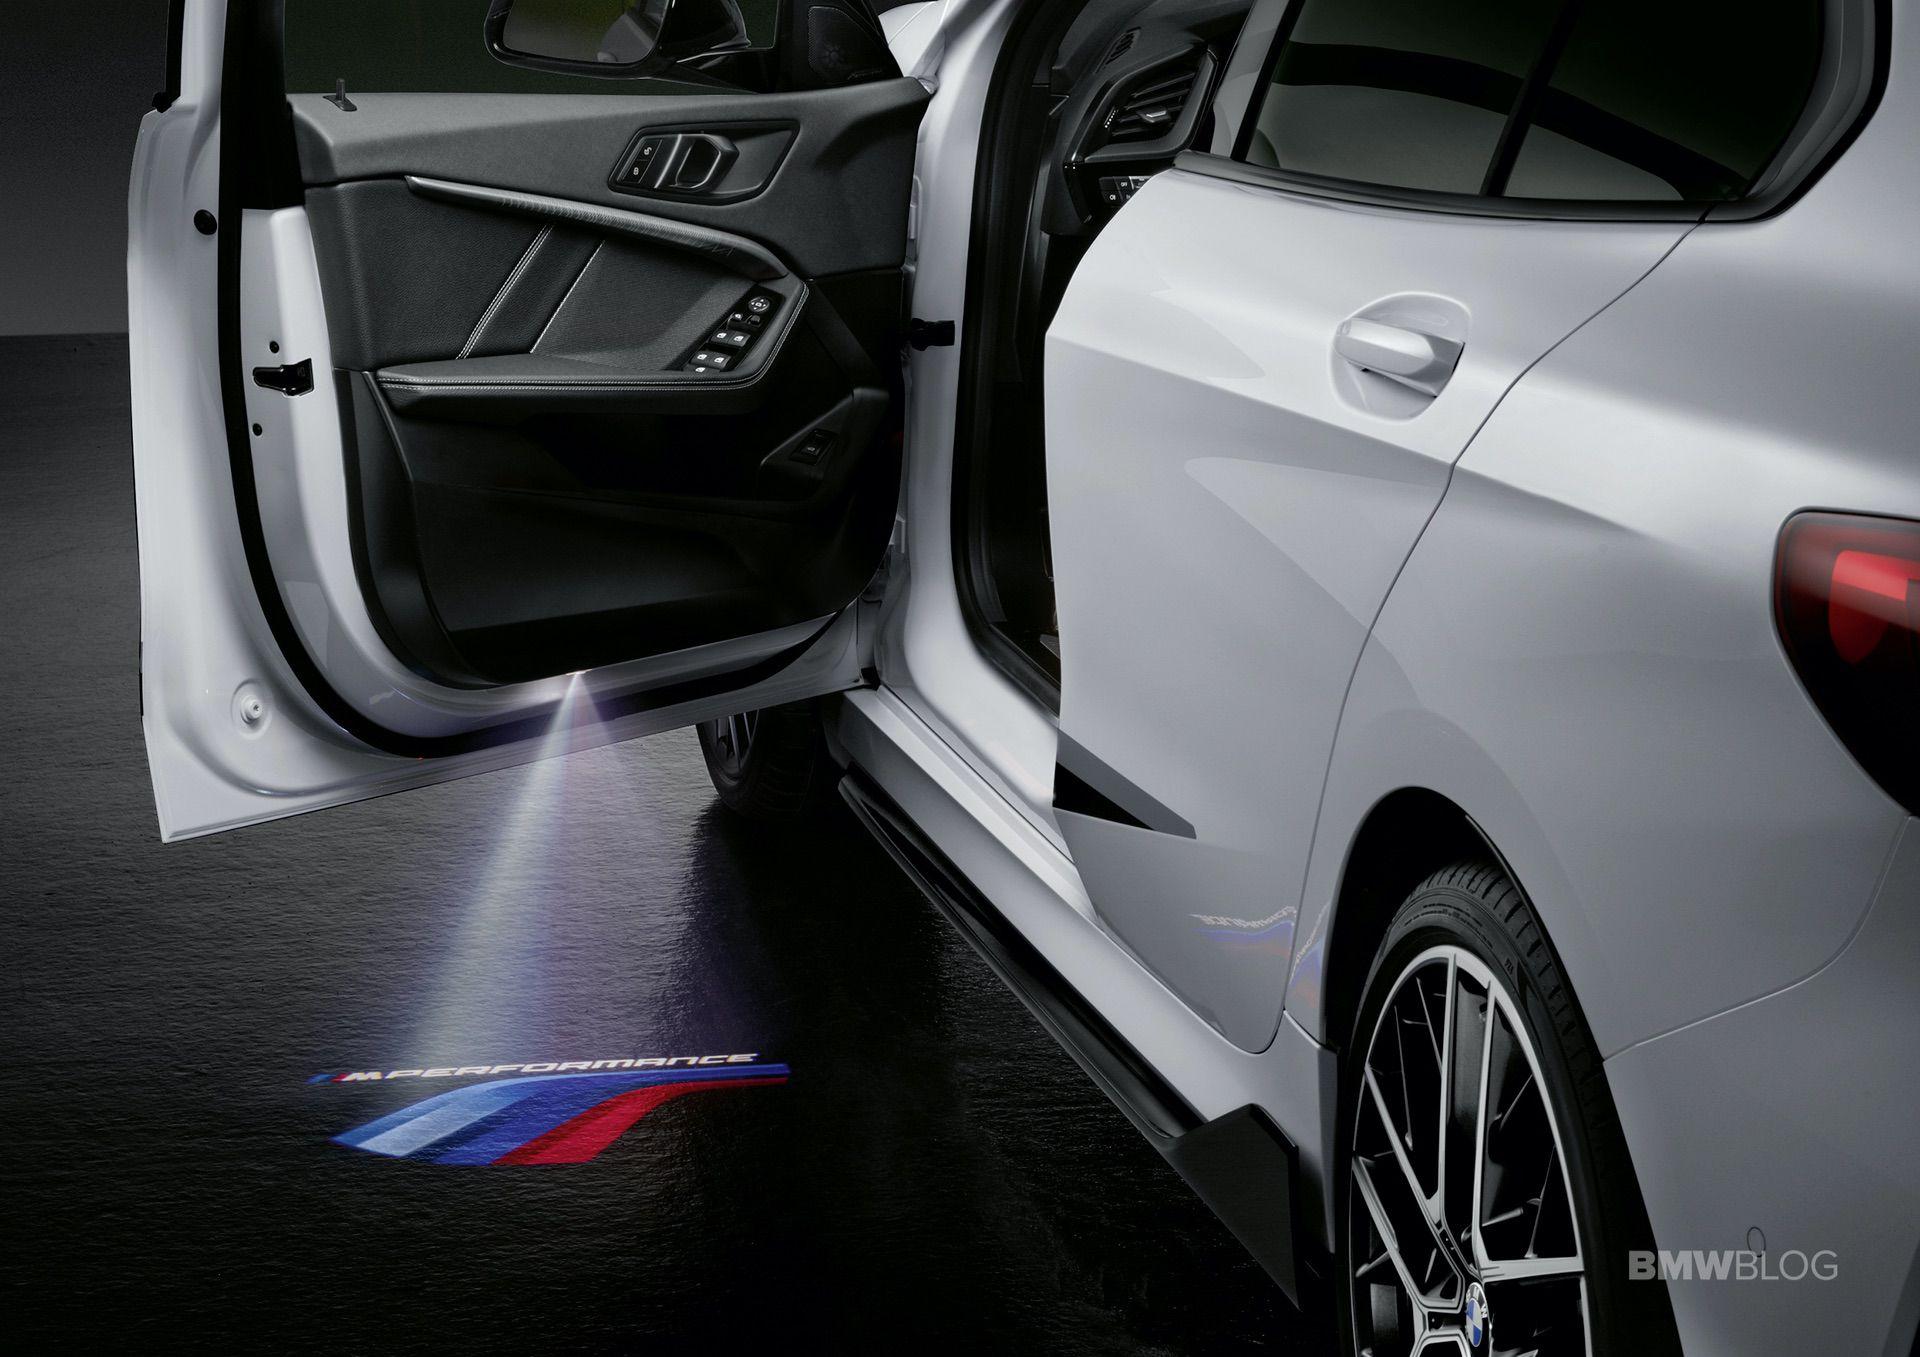 BMW-1-Series-M-Performance-Parts-15.jpg